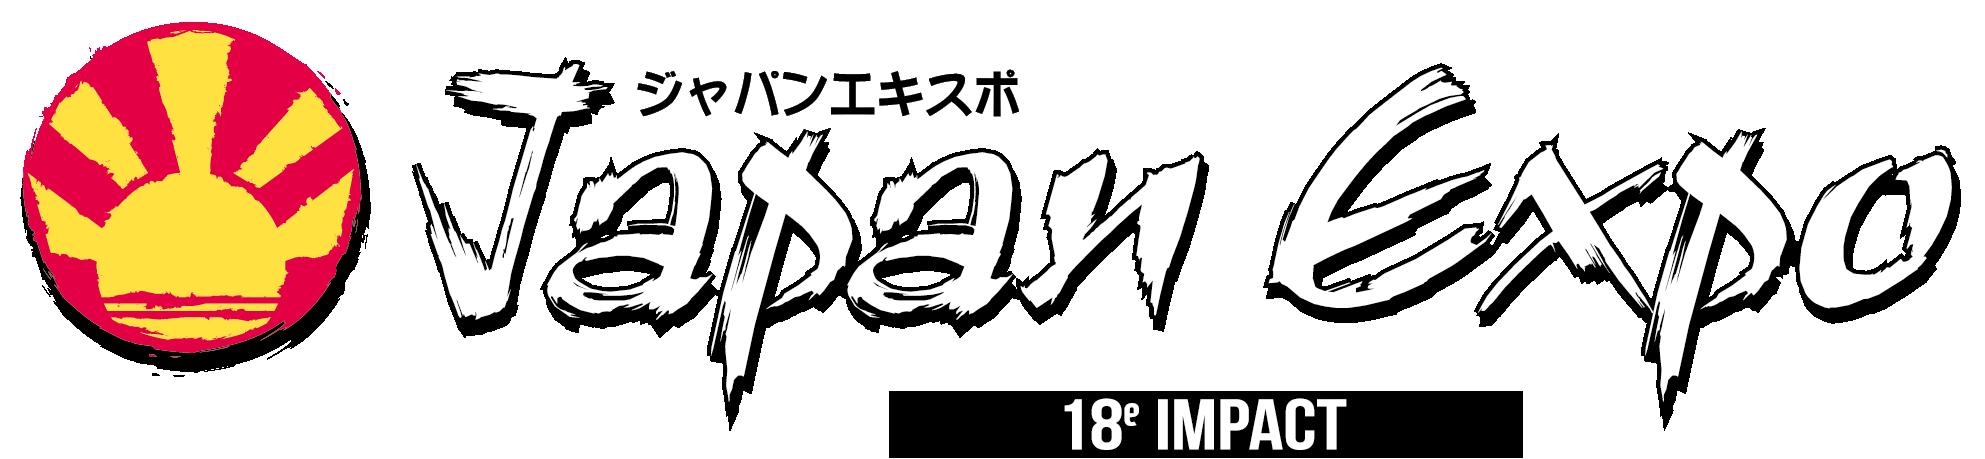 logo japan expo fond transparent